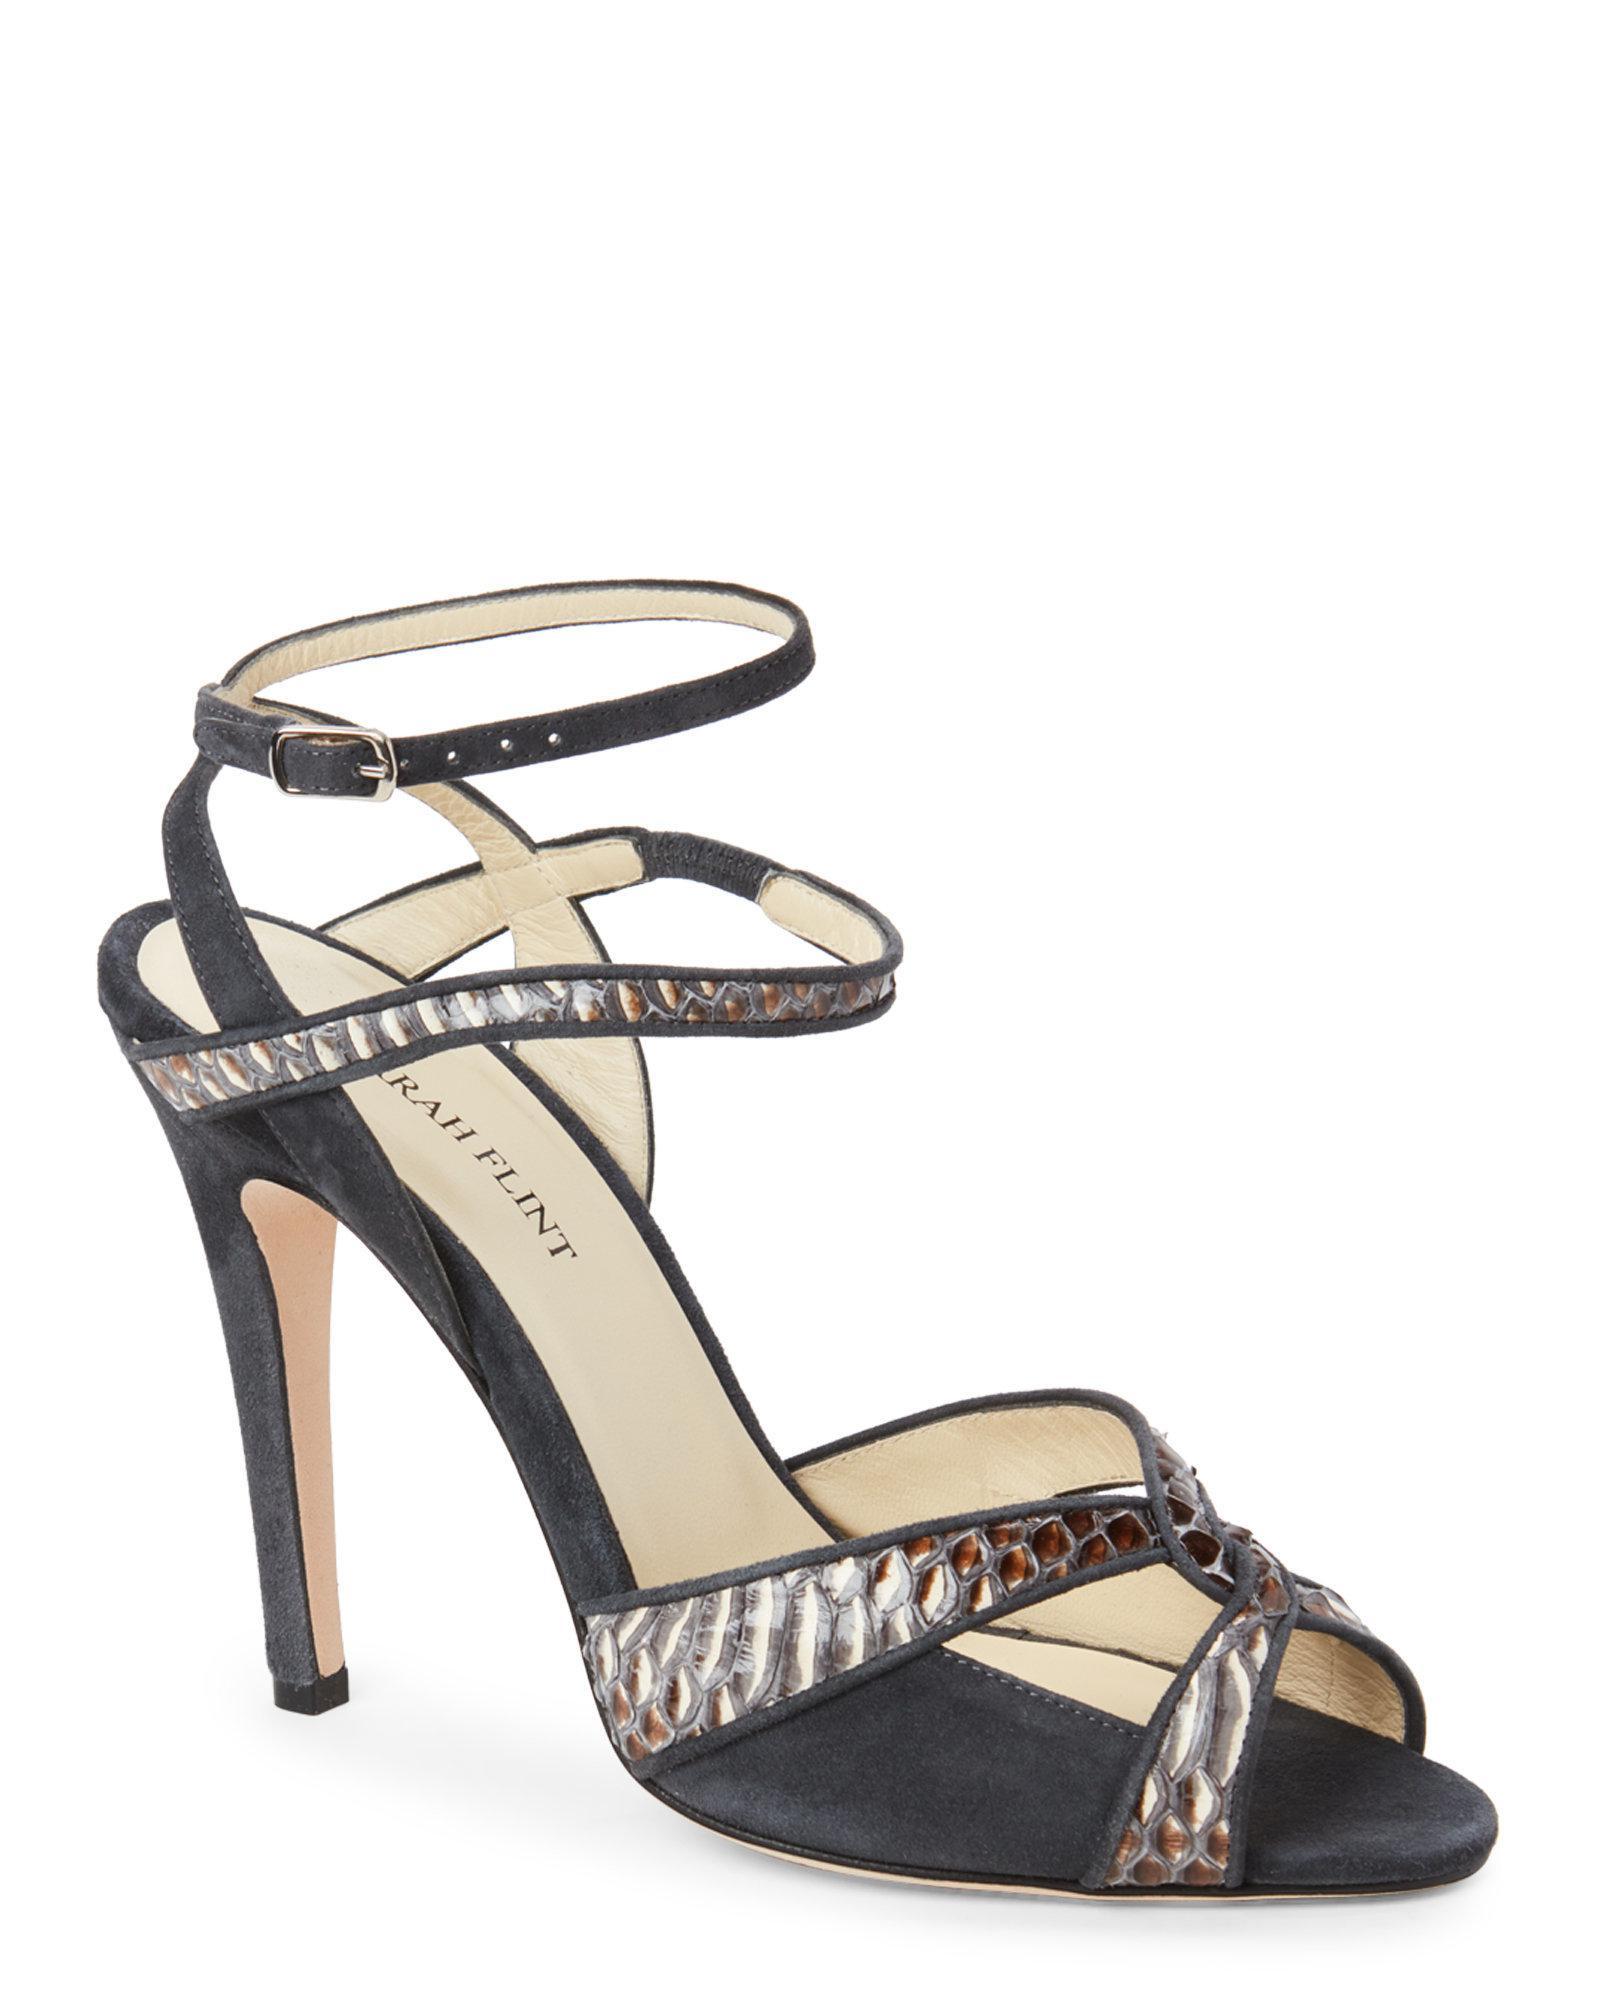 Sarah Flint Jewelled heel sandals